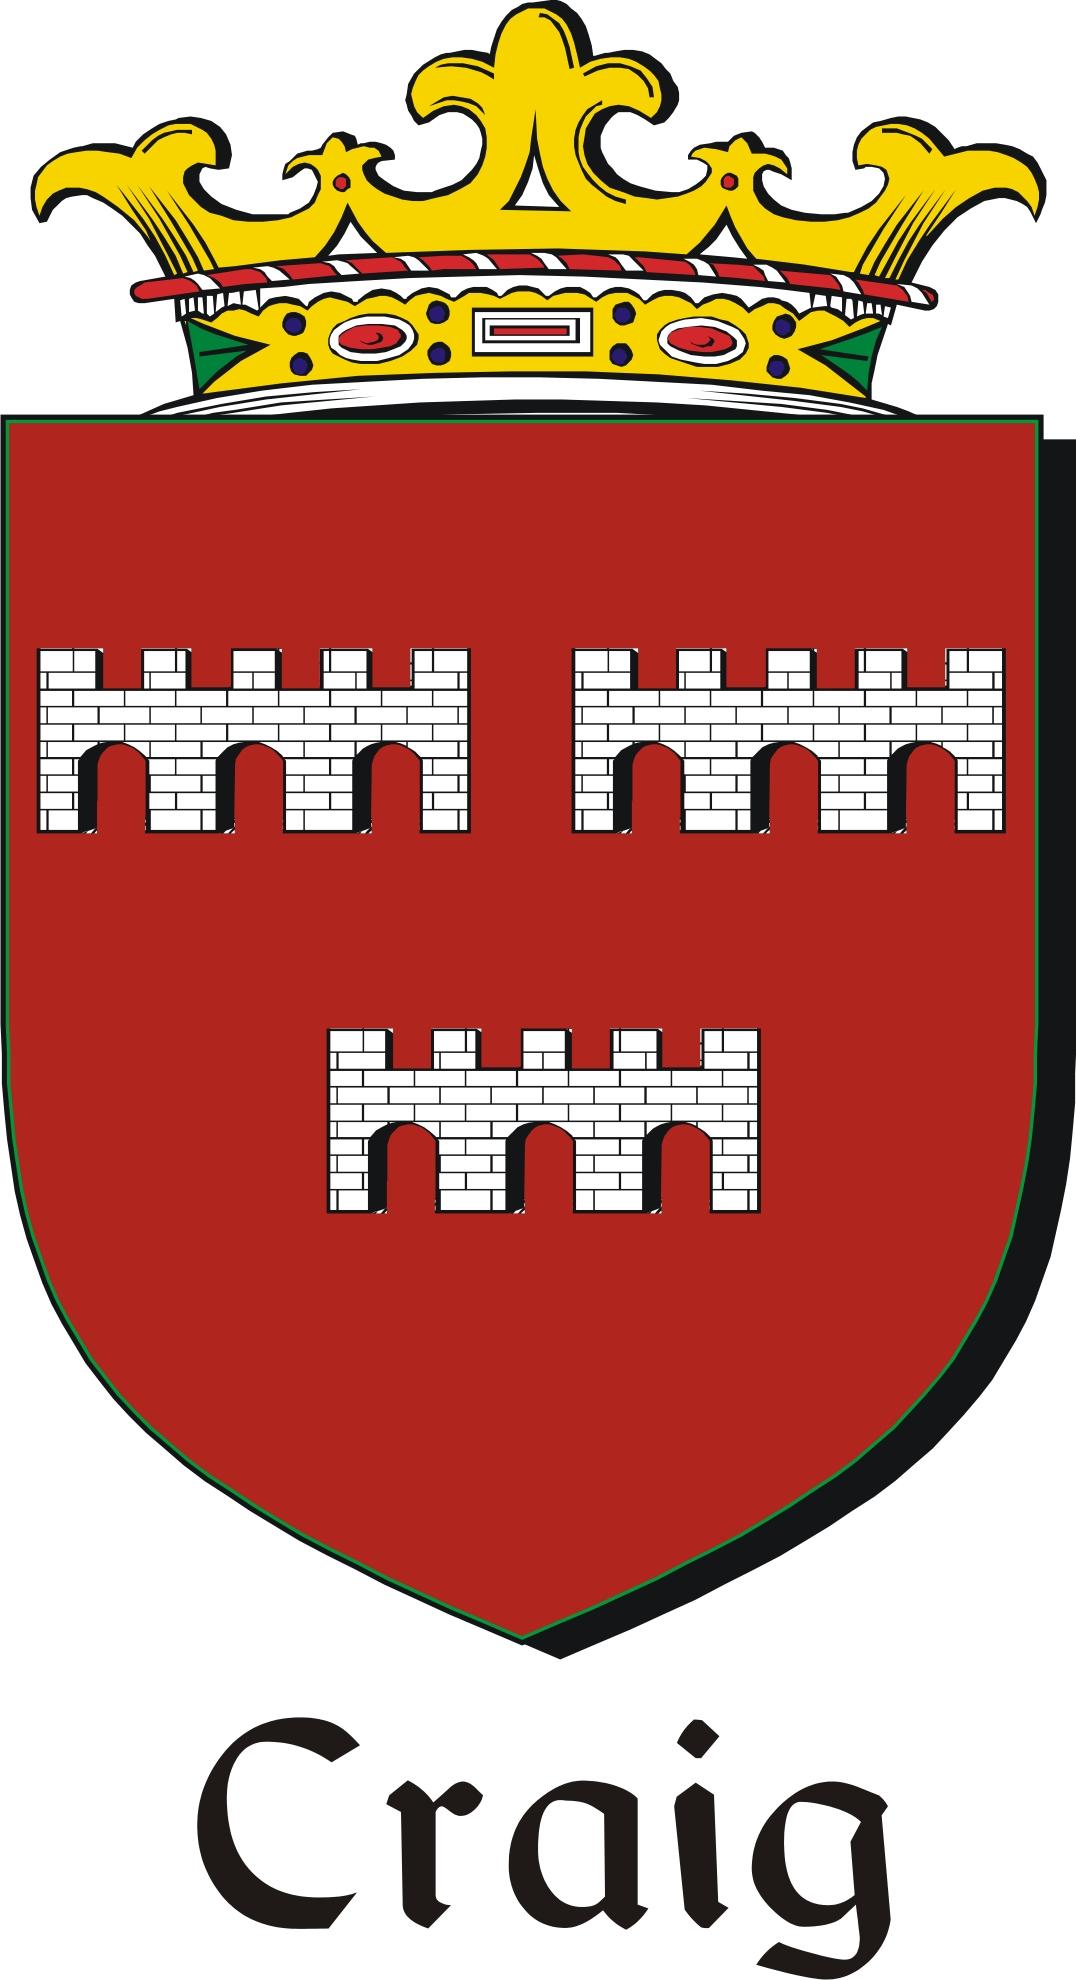 craig family crest    irish coat of arms image download